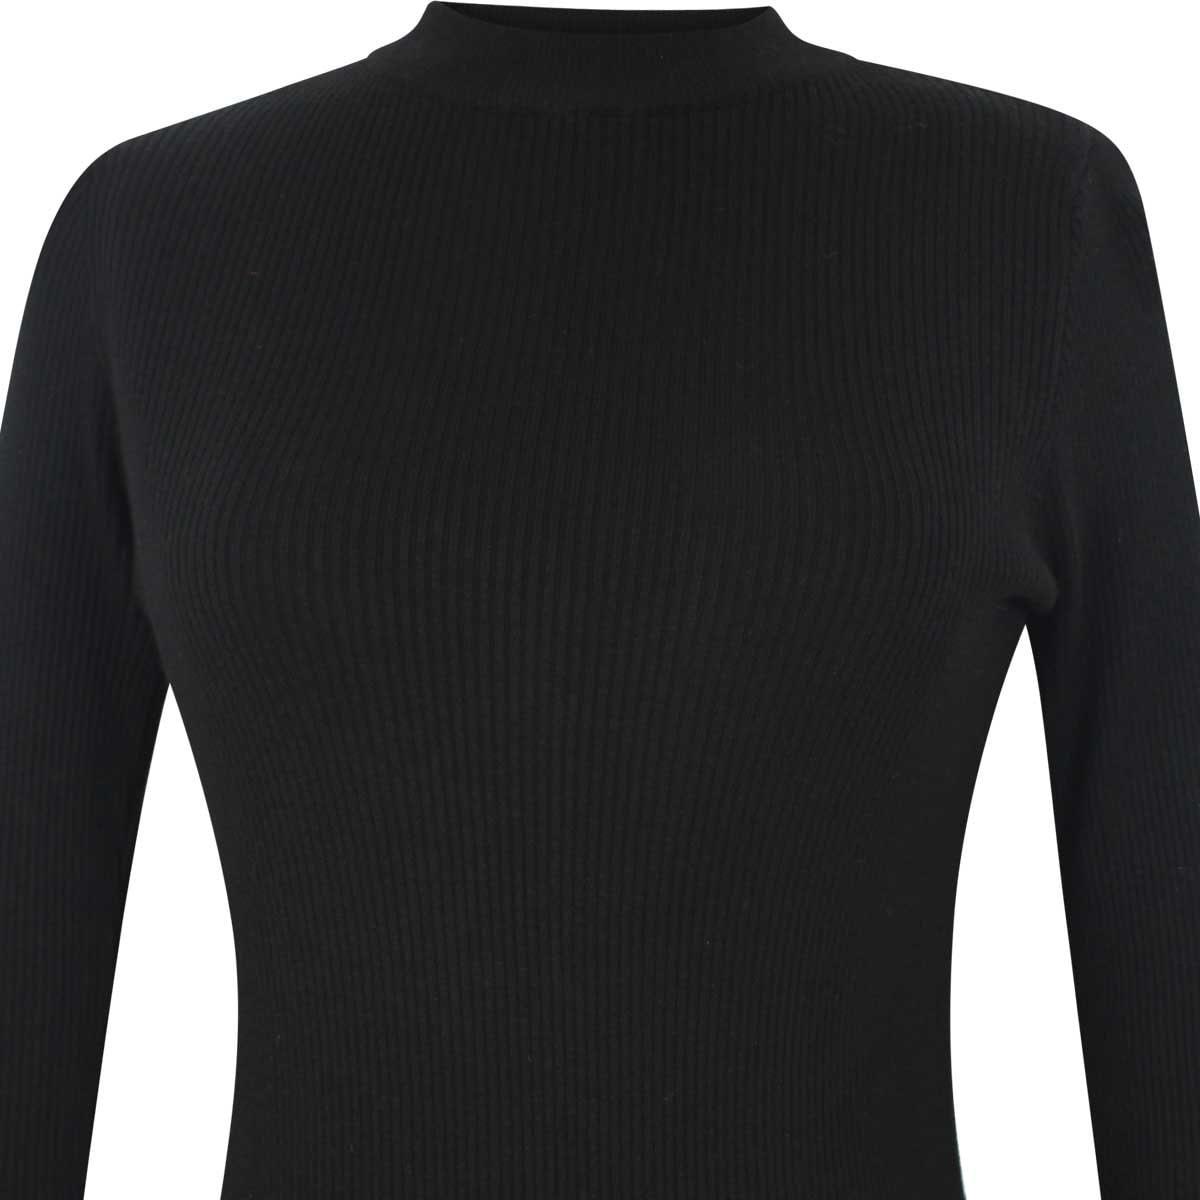 Suéter Negro de Manga Larga Elle